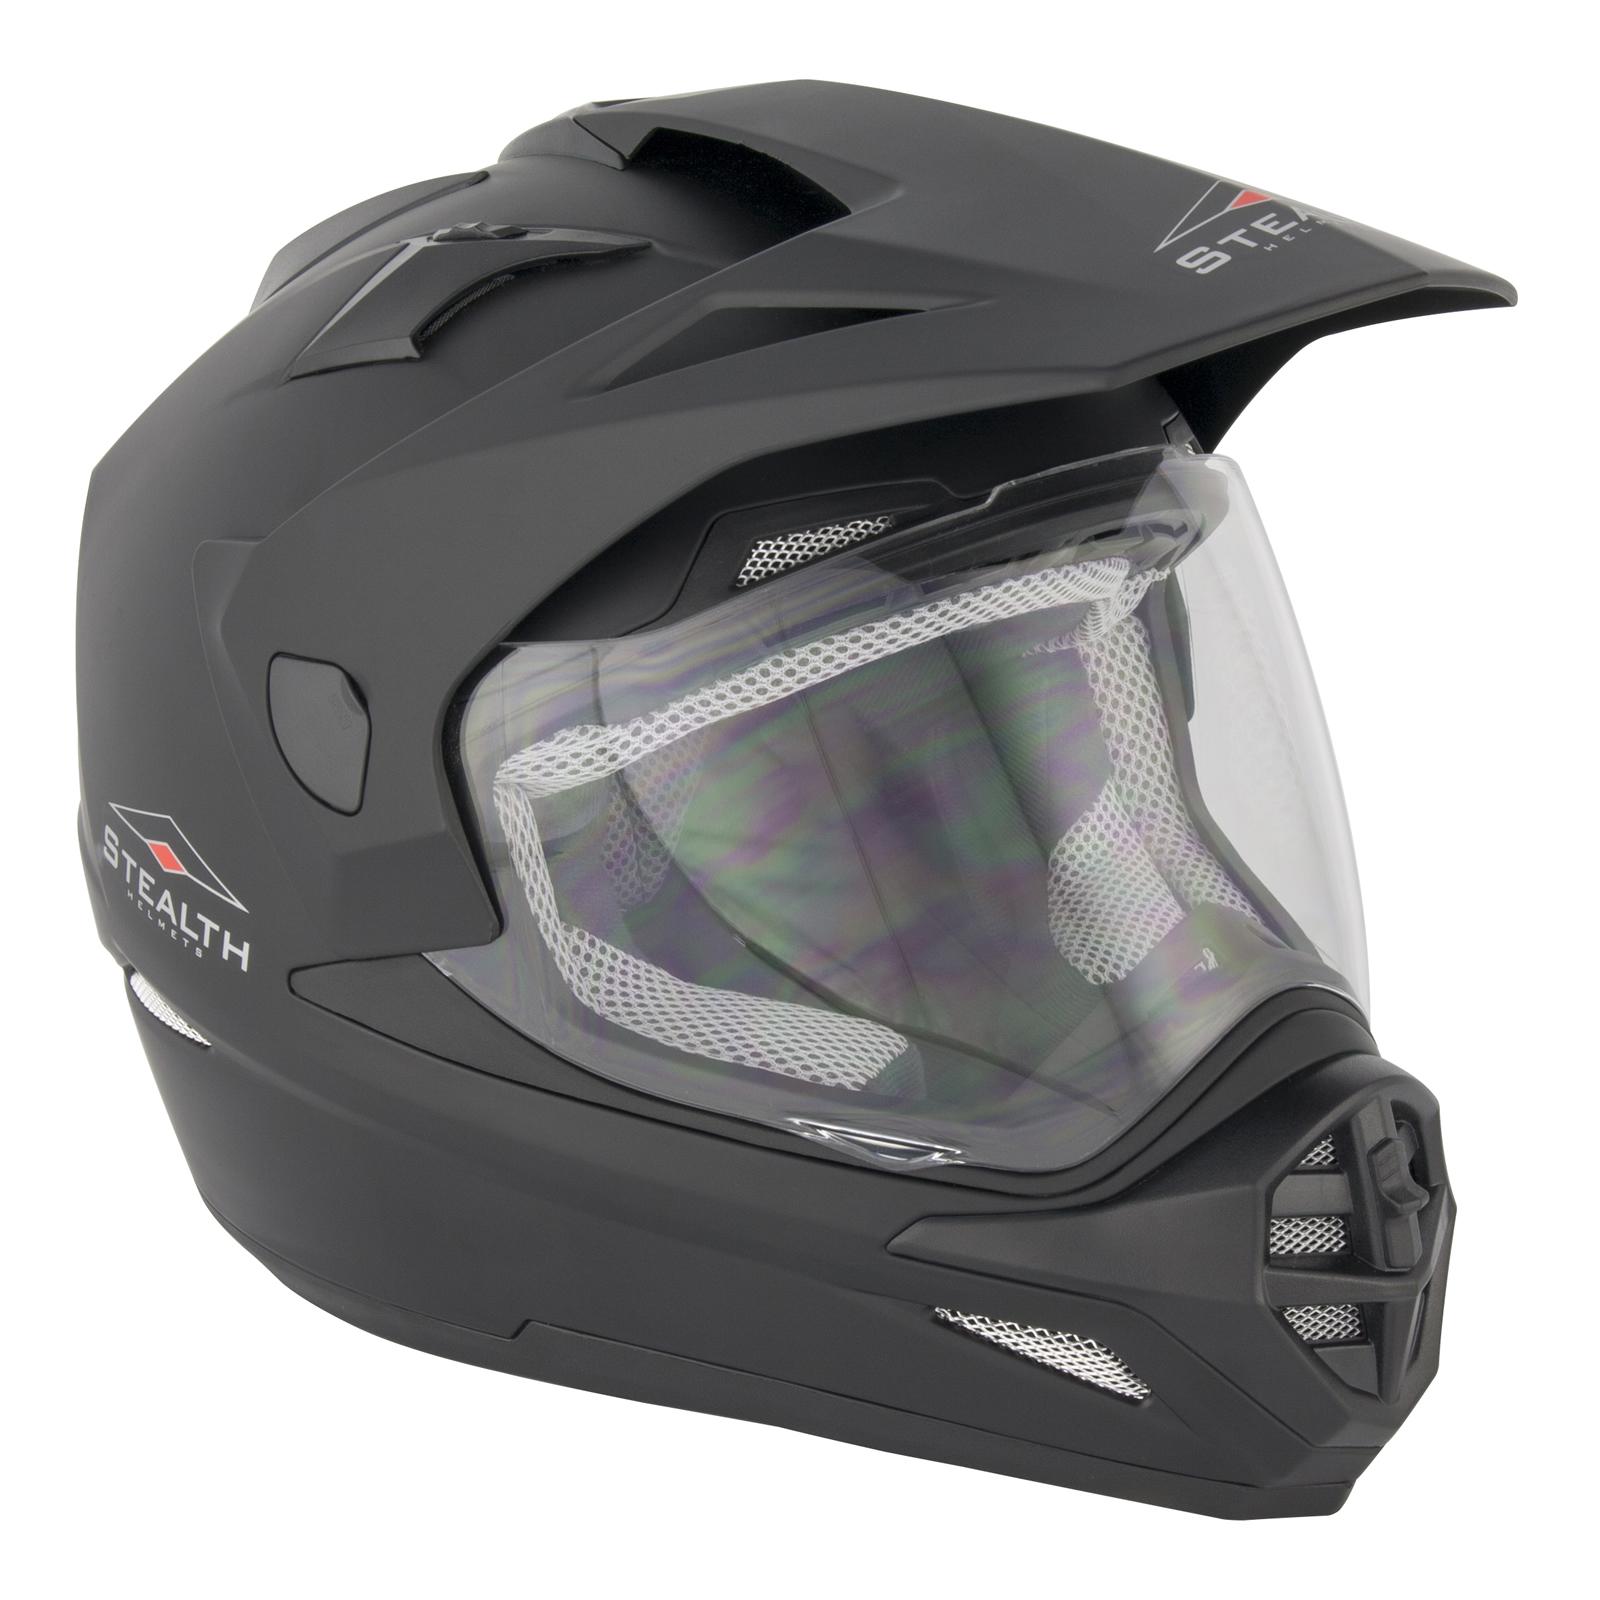 Bell Dual Sport Helmet >> STEALTH HD-009 ADVENTURE DUAL SPORT MOTOCROSS MOTORCYCLE MOTORBIKE PLAIN HELMET | eBay